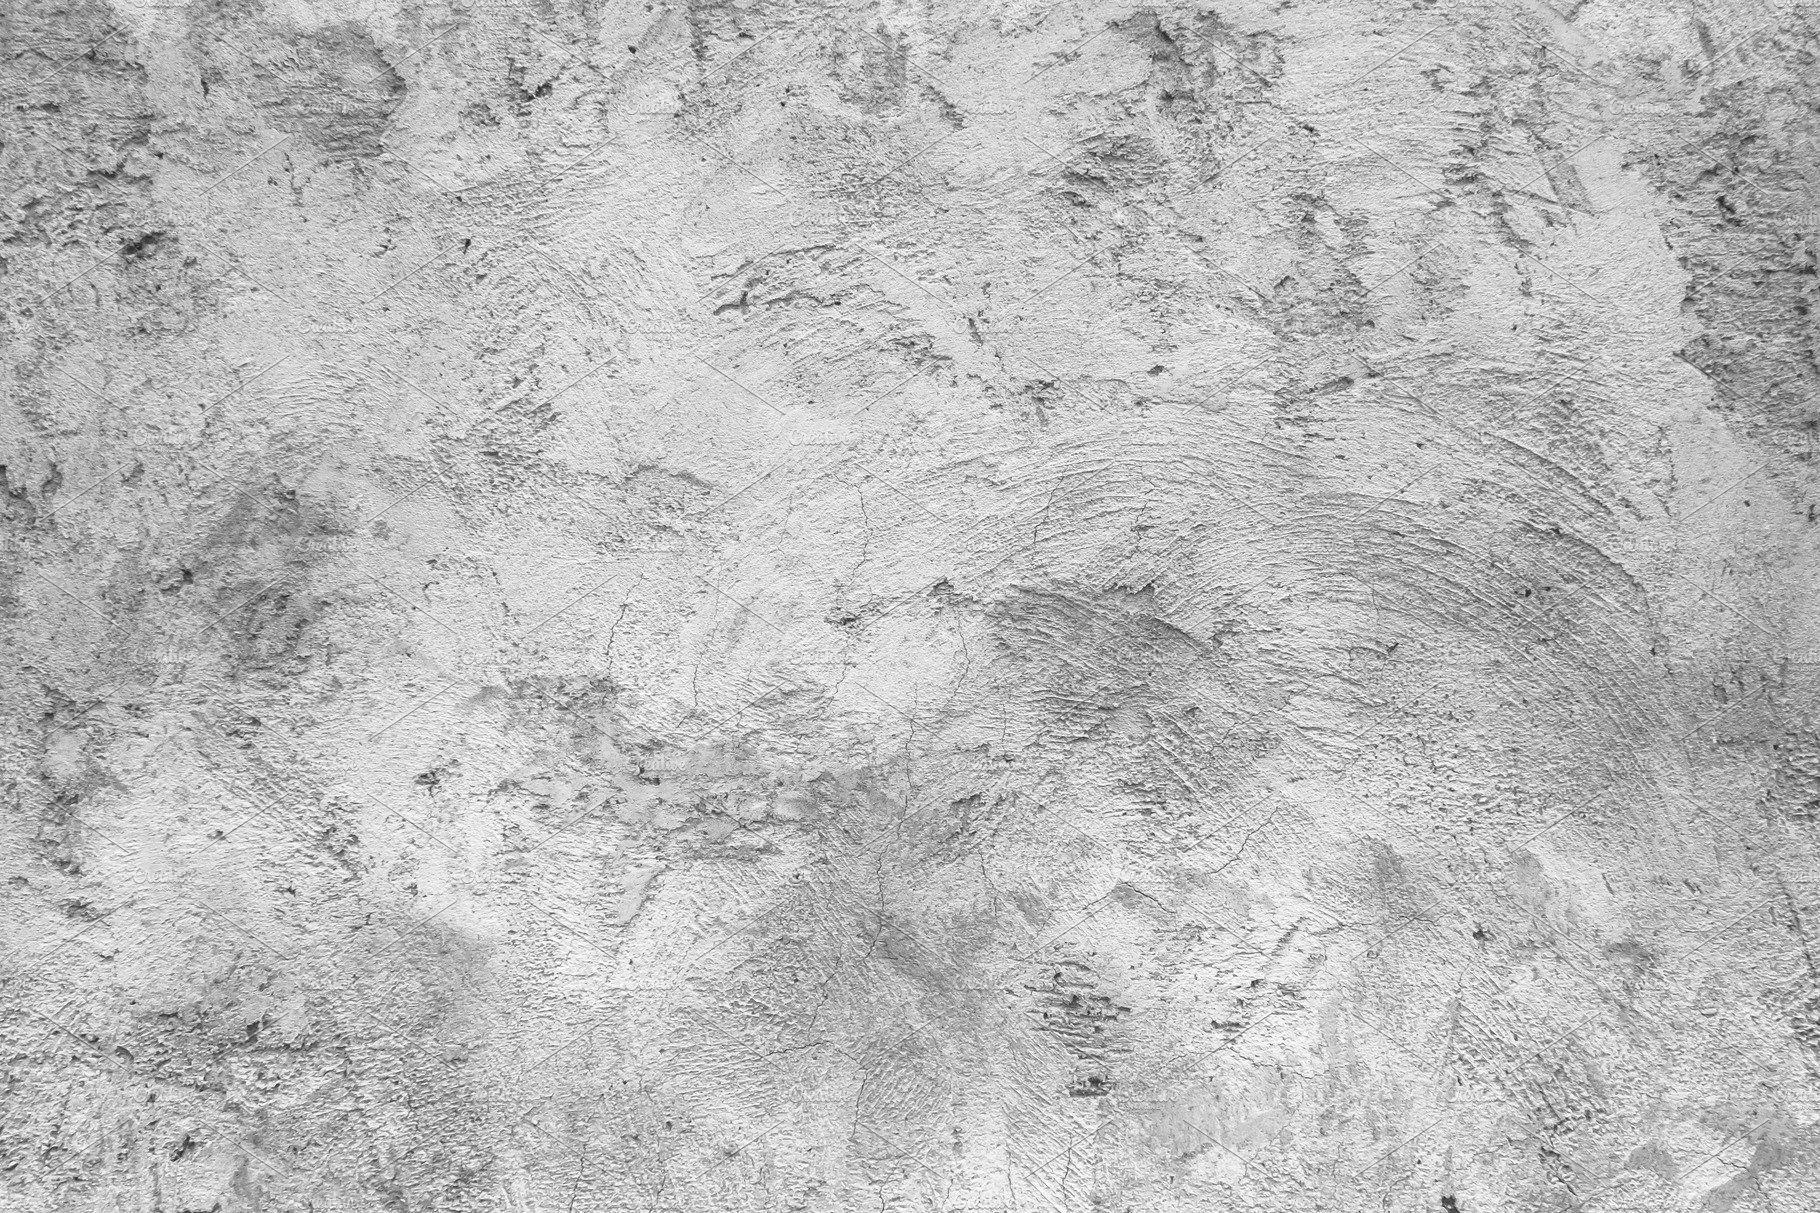 White Concrete Wall Texture Concrete Wall Texture White Concrete Concrete Texture